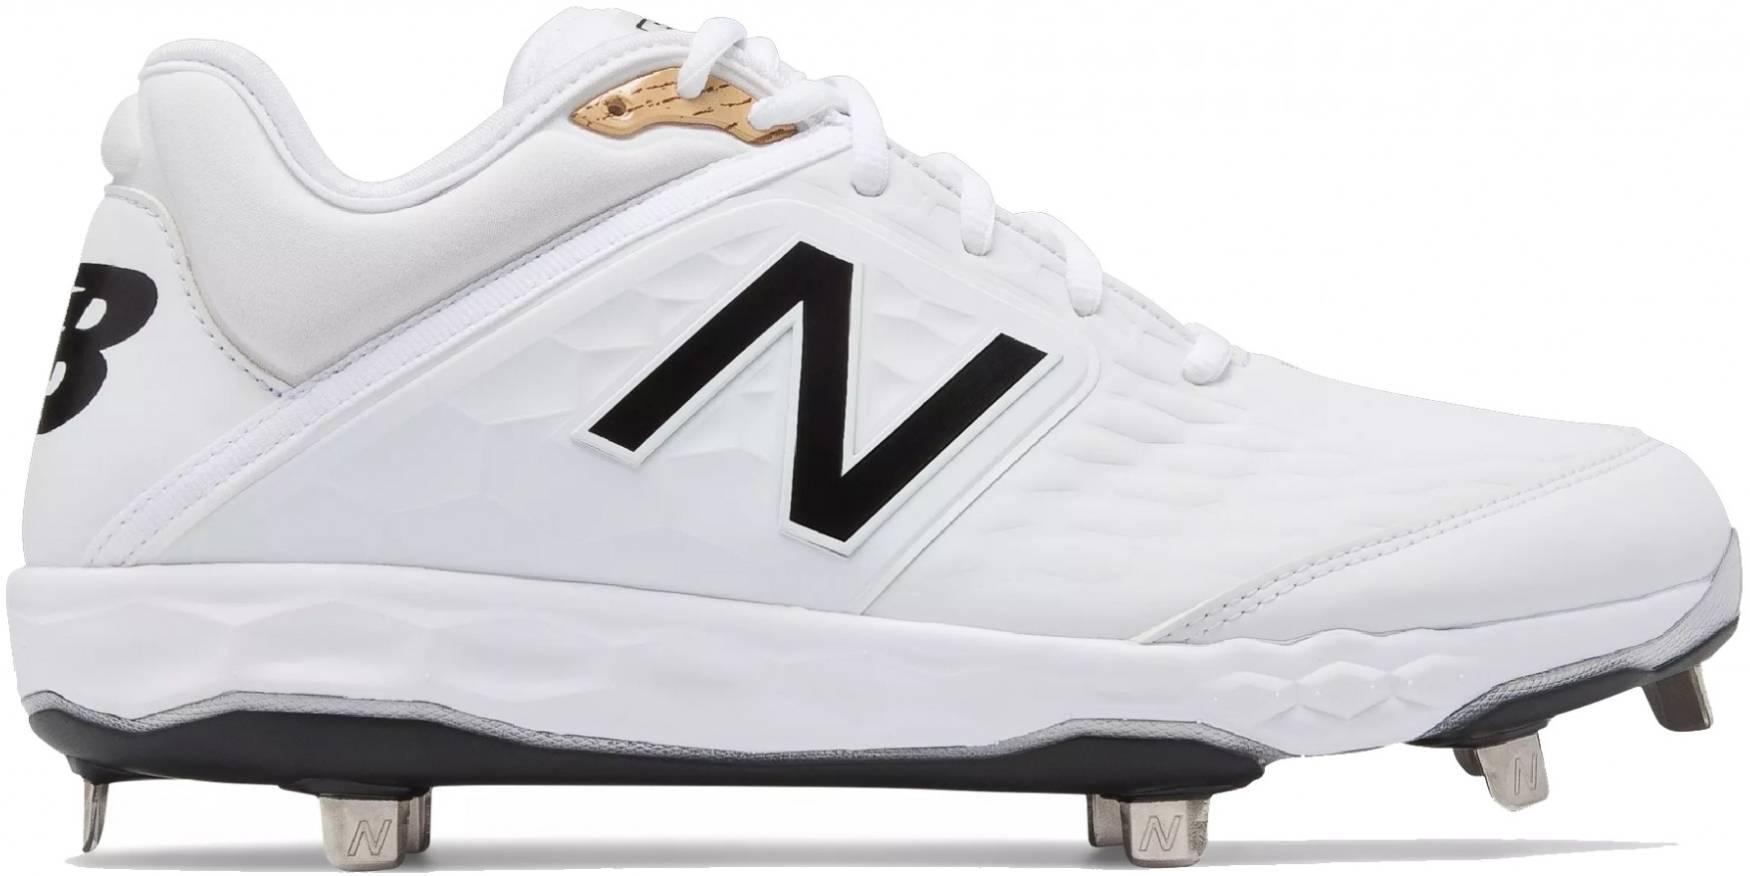 Save 51% on New Balance Baseball Cleats